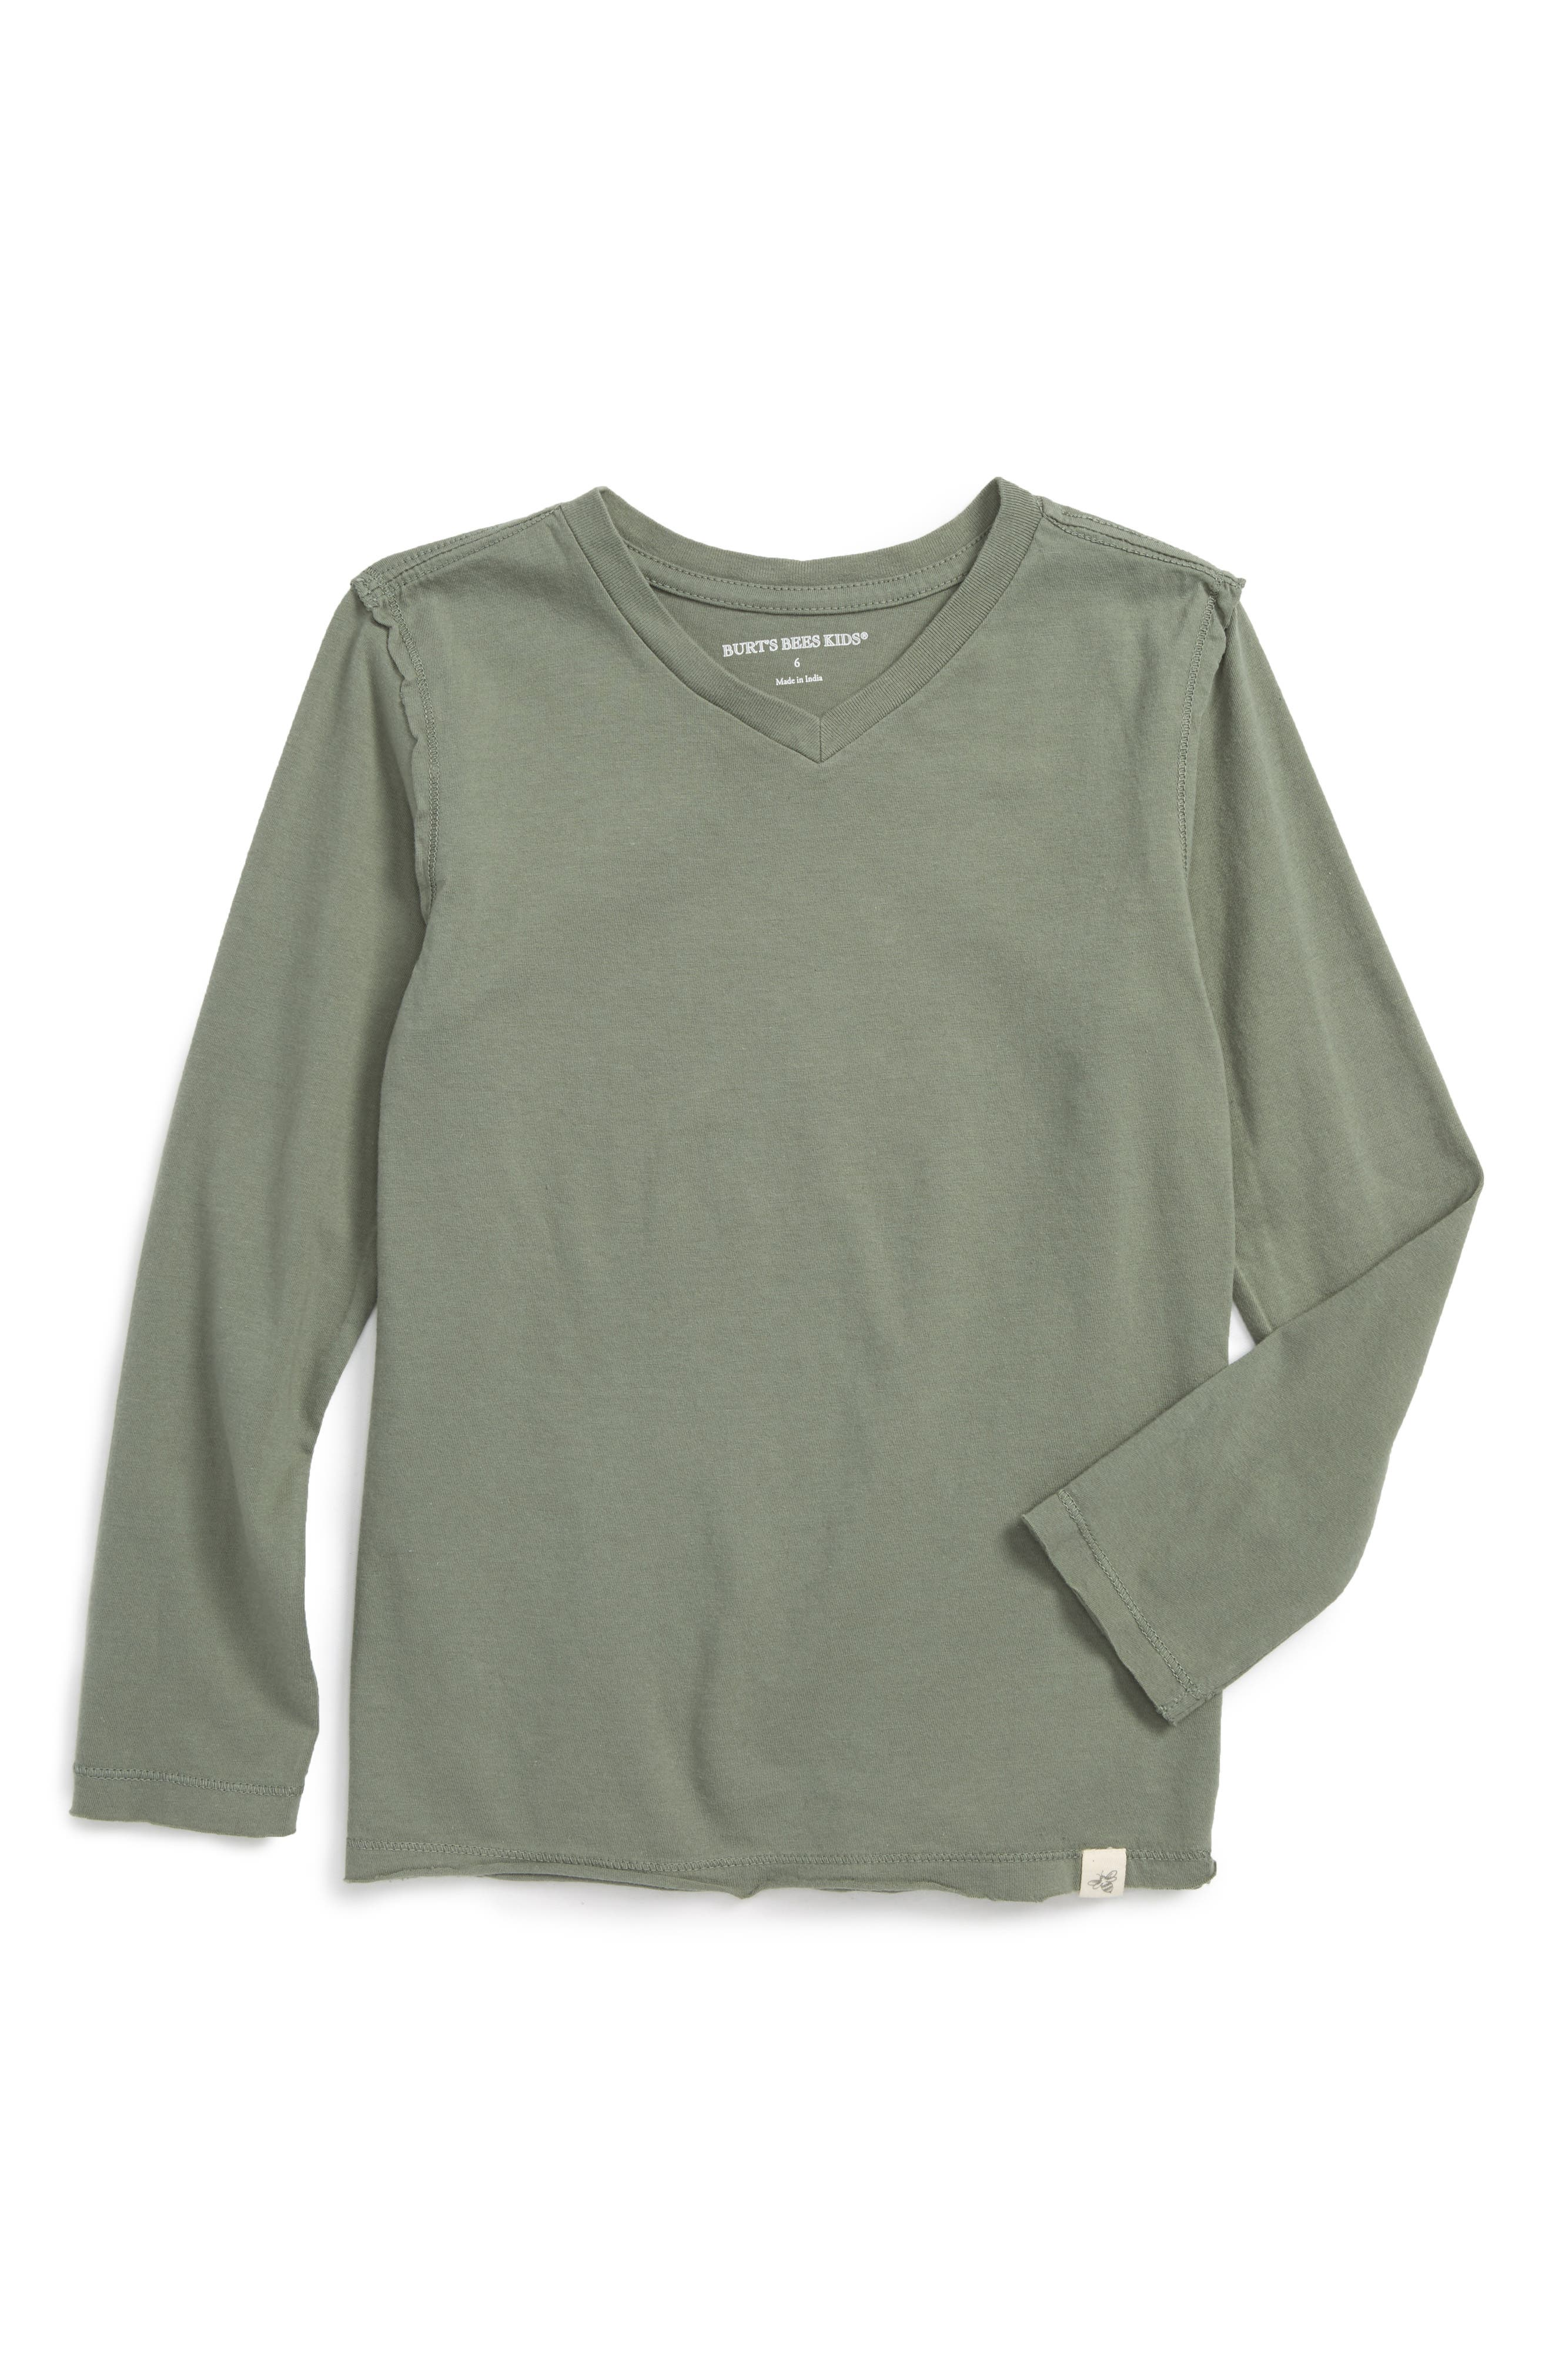 Burt's Bees Baby V-Neck Organic Cotton T-Shirt (Toddler Boys & Little Boys)